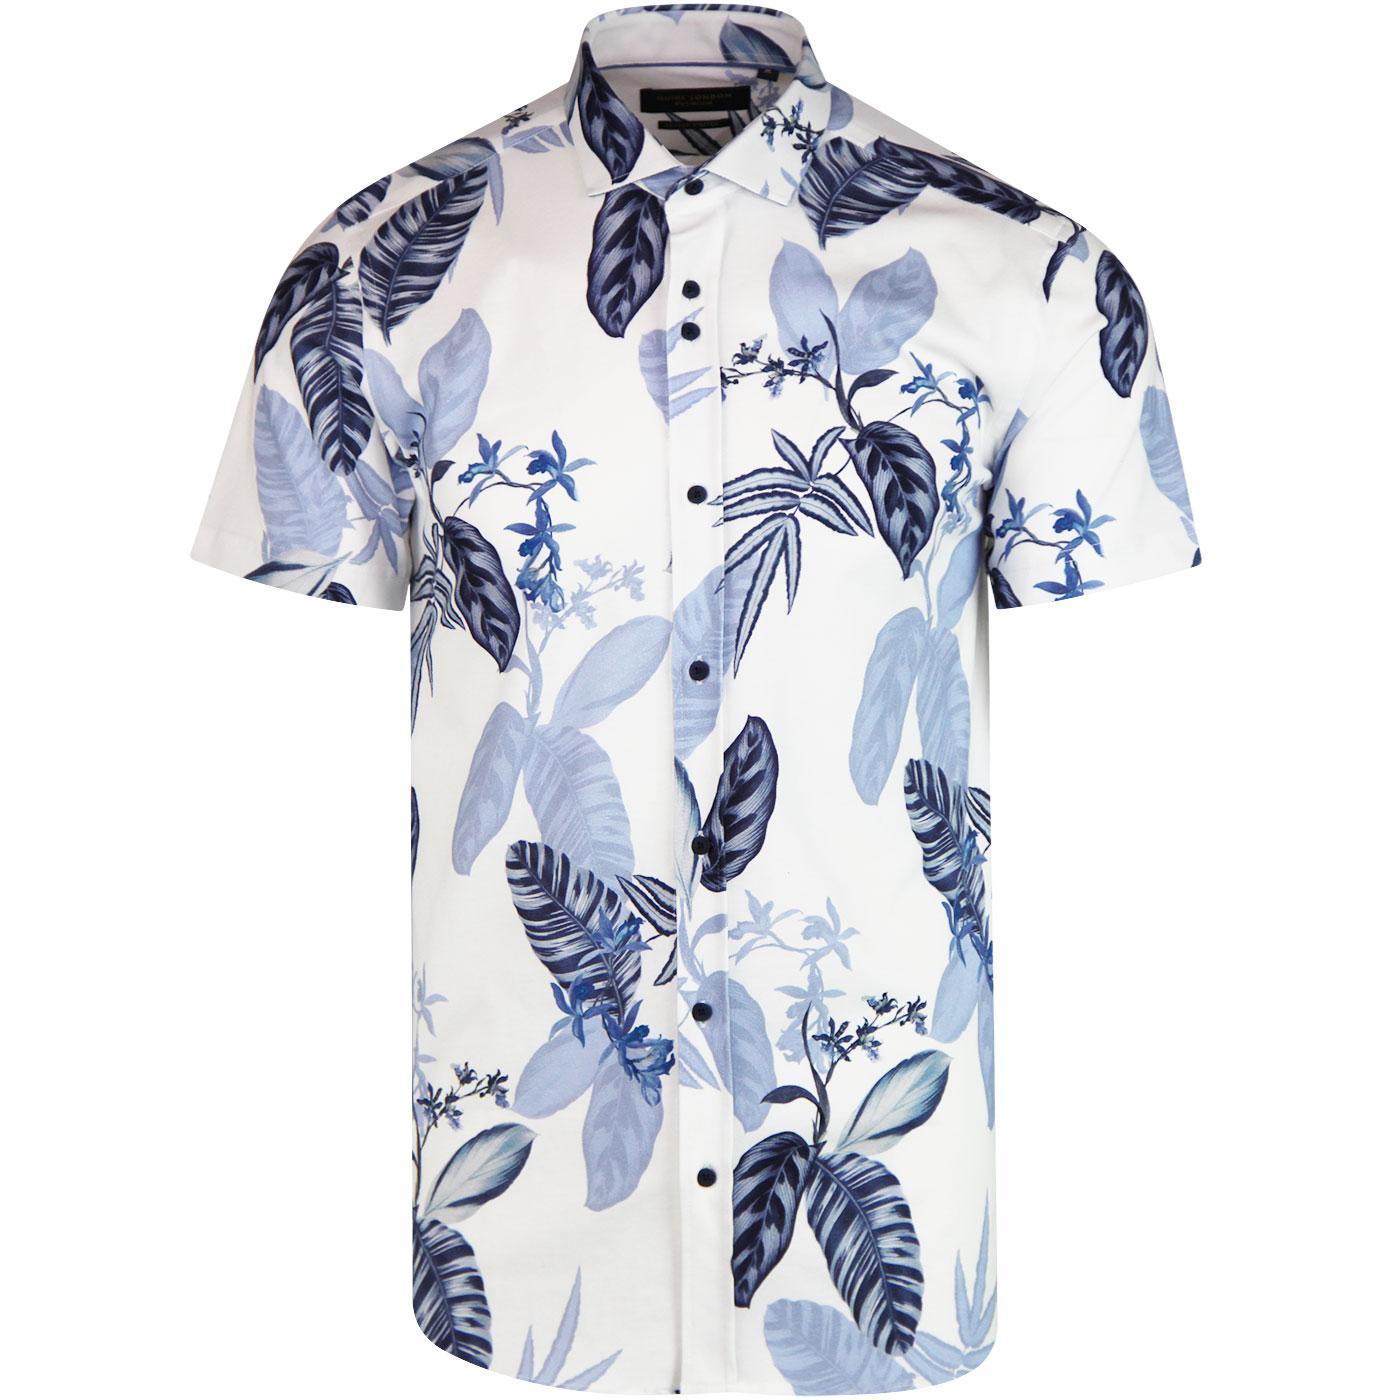 GUIDE LONDON Floral Retro Short Sleeve Shirt Bl/W